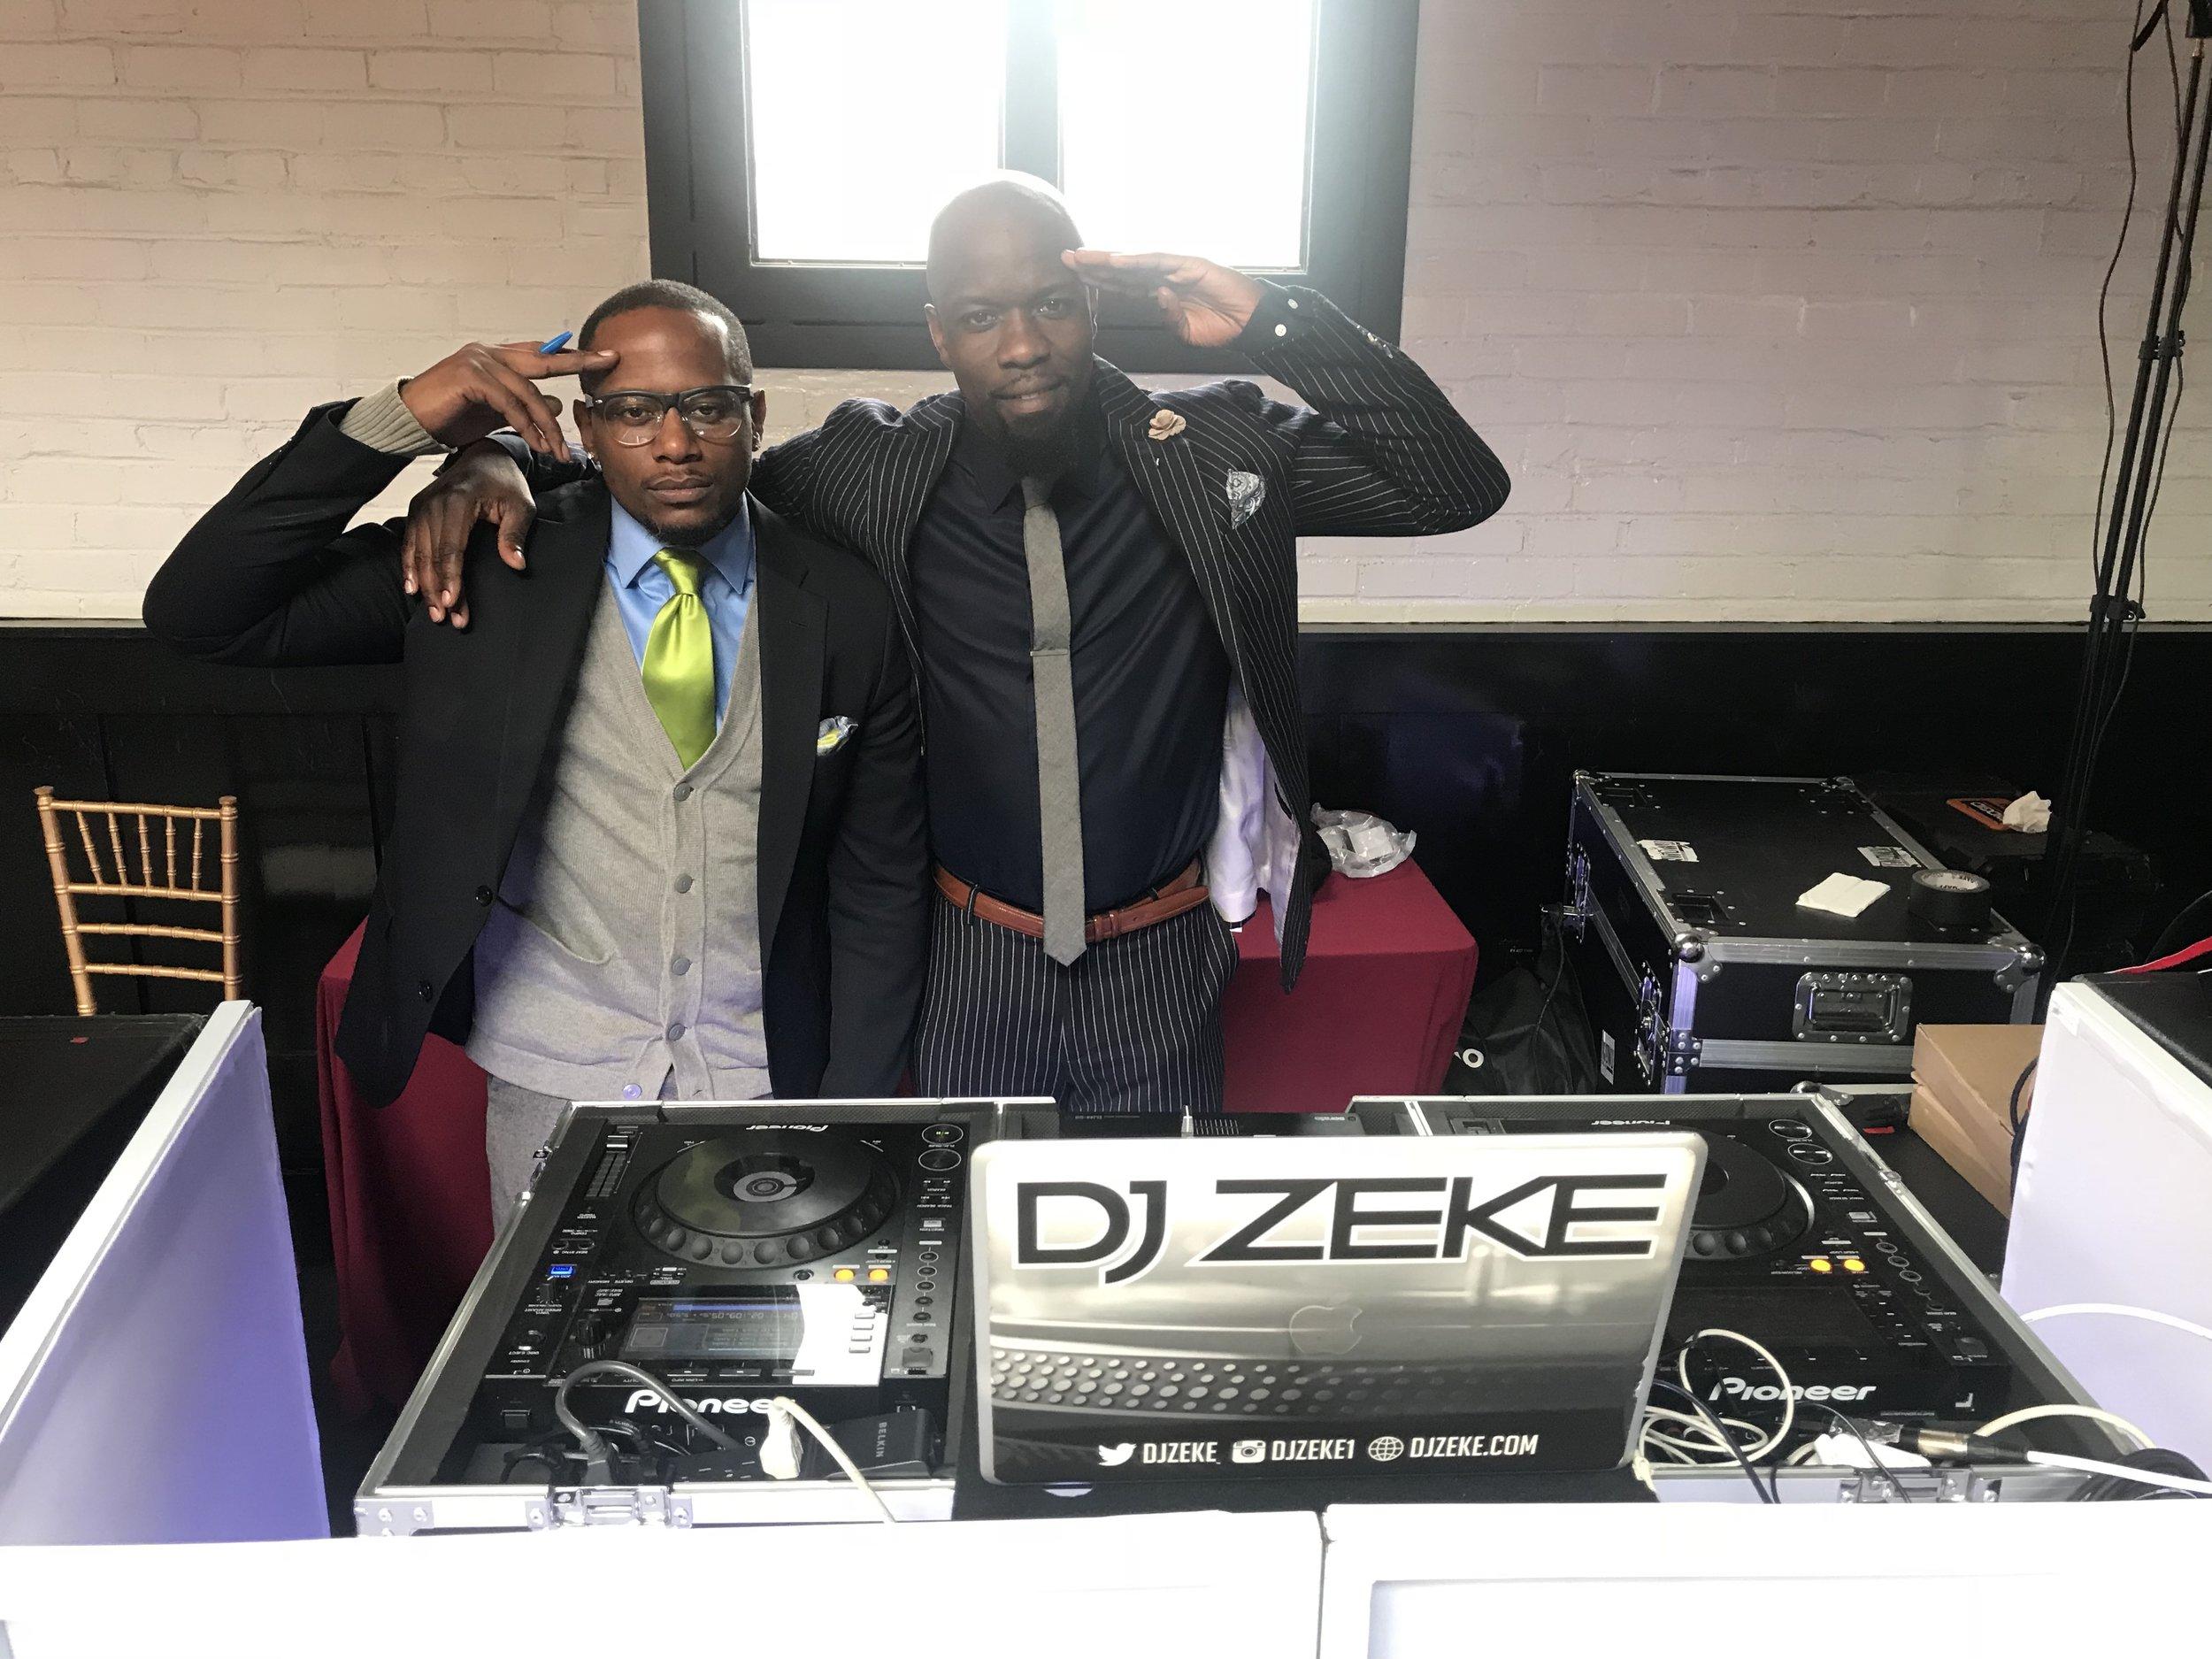 Mr. & Mrs. White Recap Video (DJ Zeke Entertainment LLC) 10/28/18